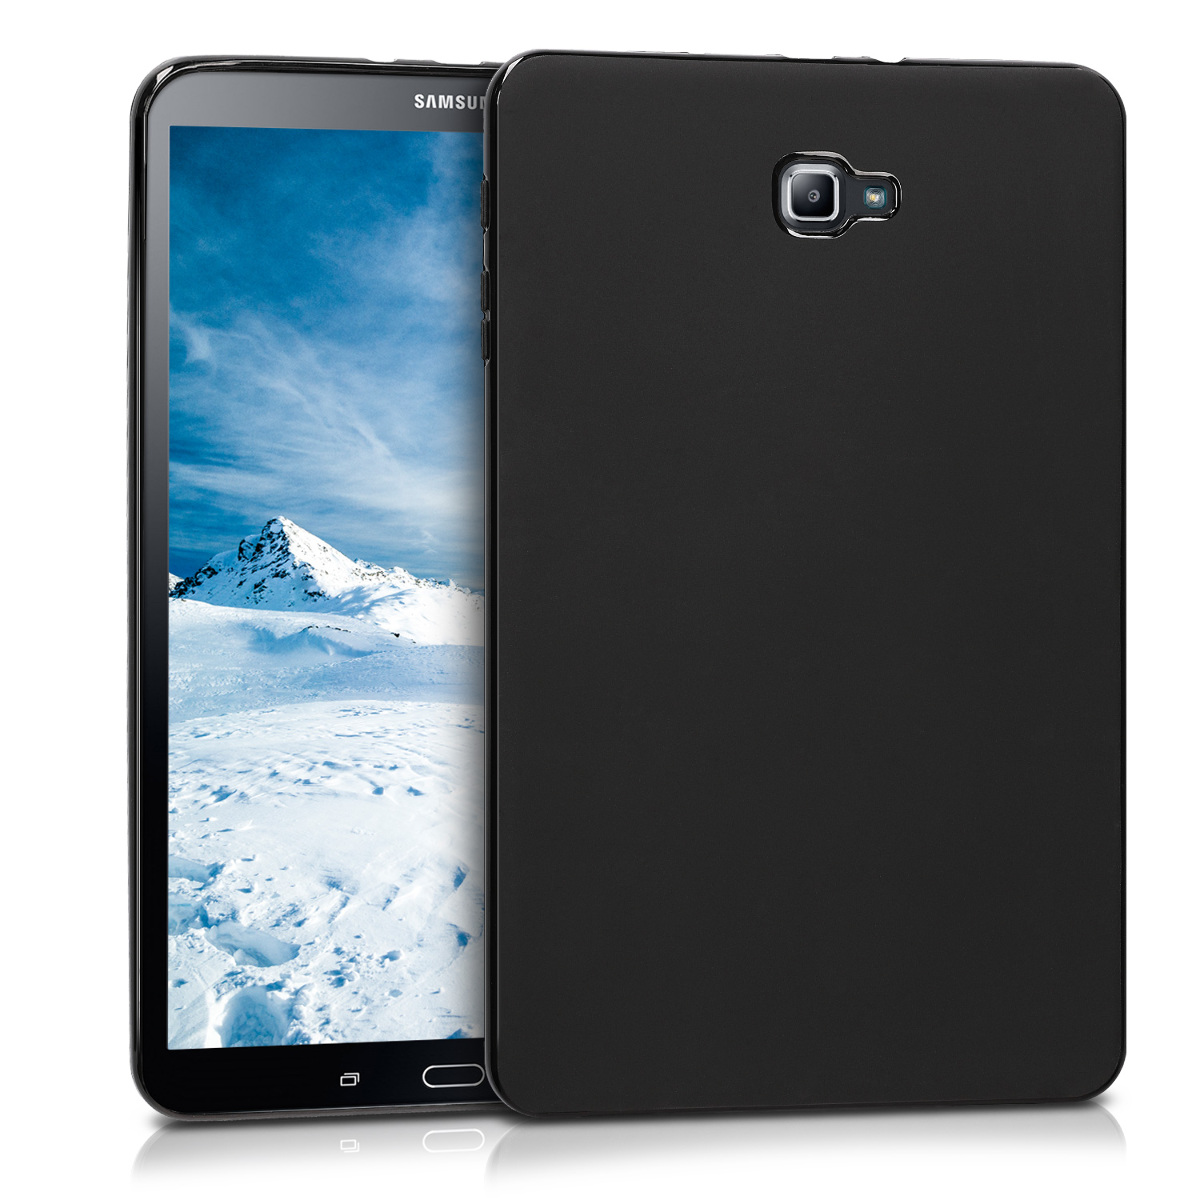 KW Θήκη Σιλικόνης Samsung Galaxy Tab A 10.1 2016 T580N/T585N - Black Matte (46648.47)